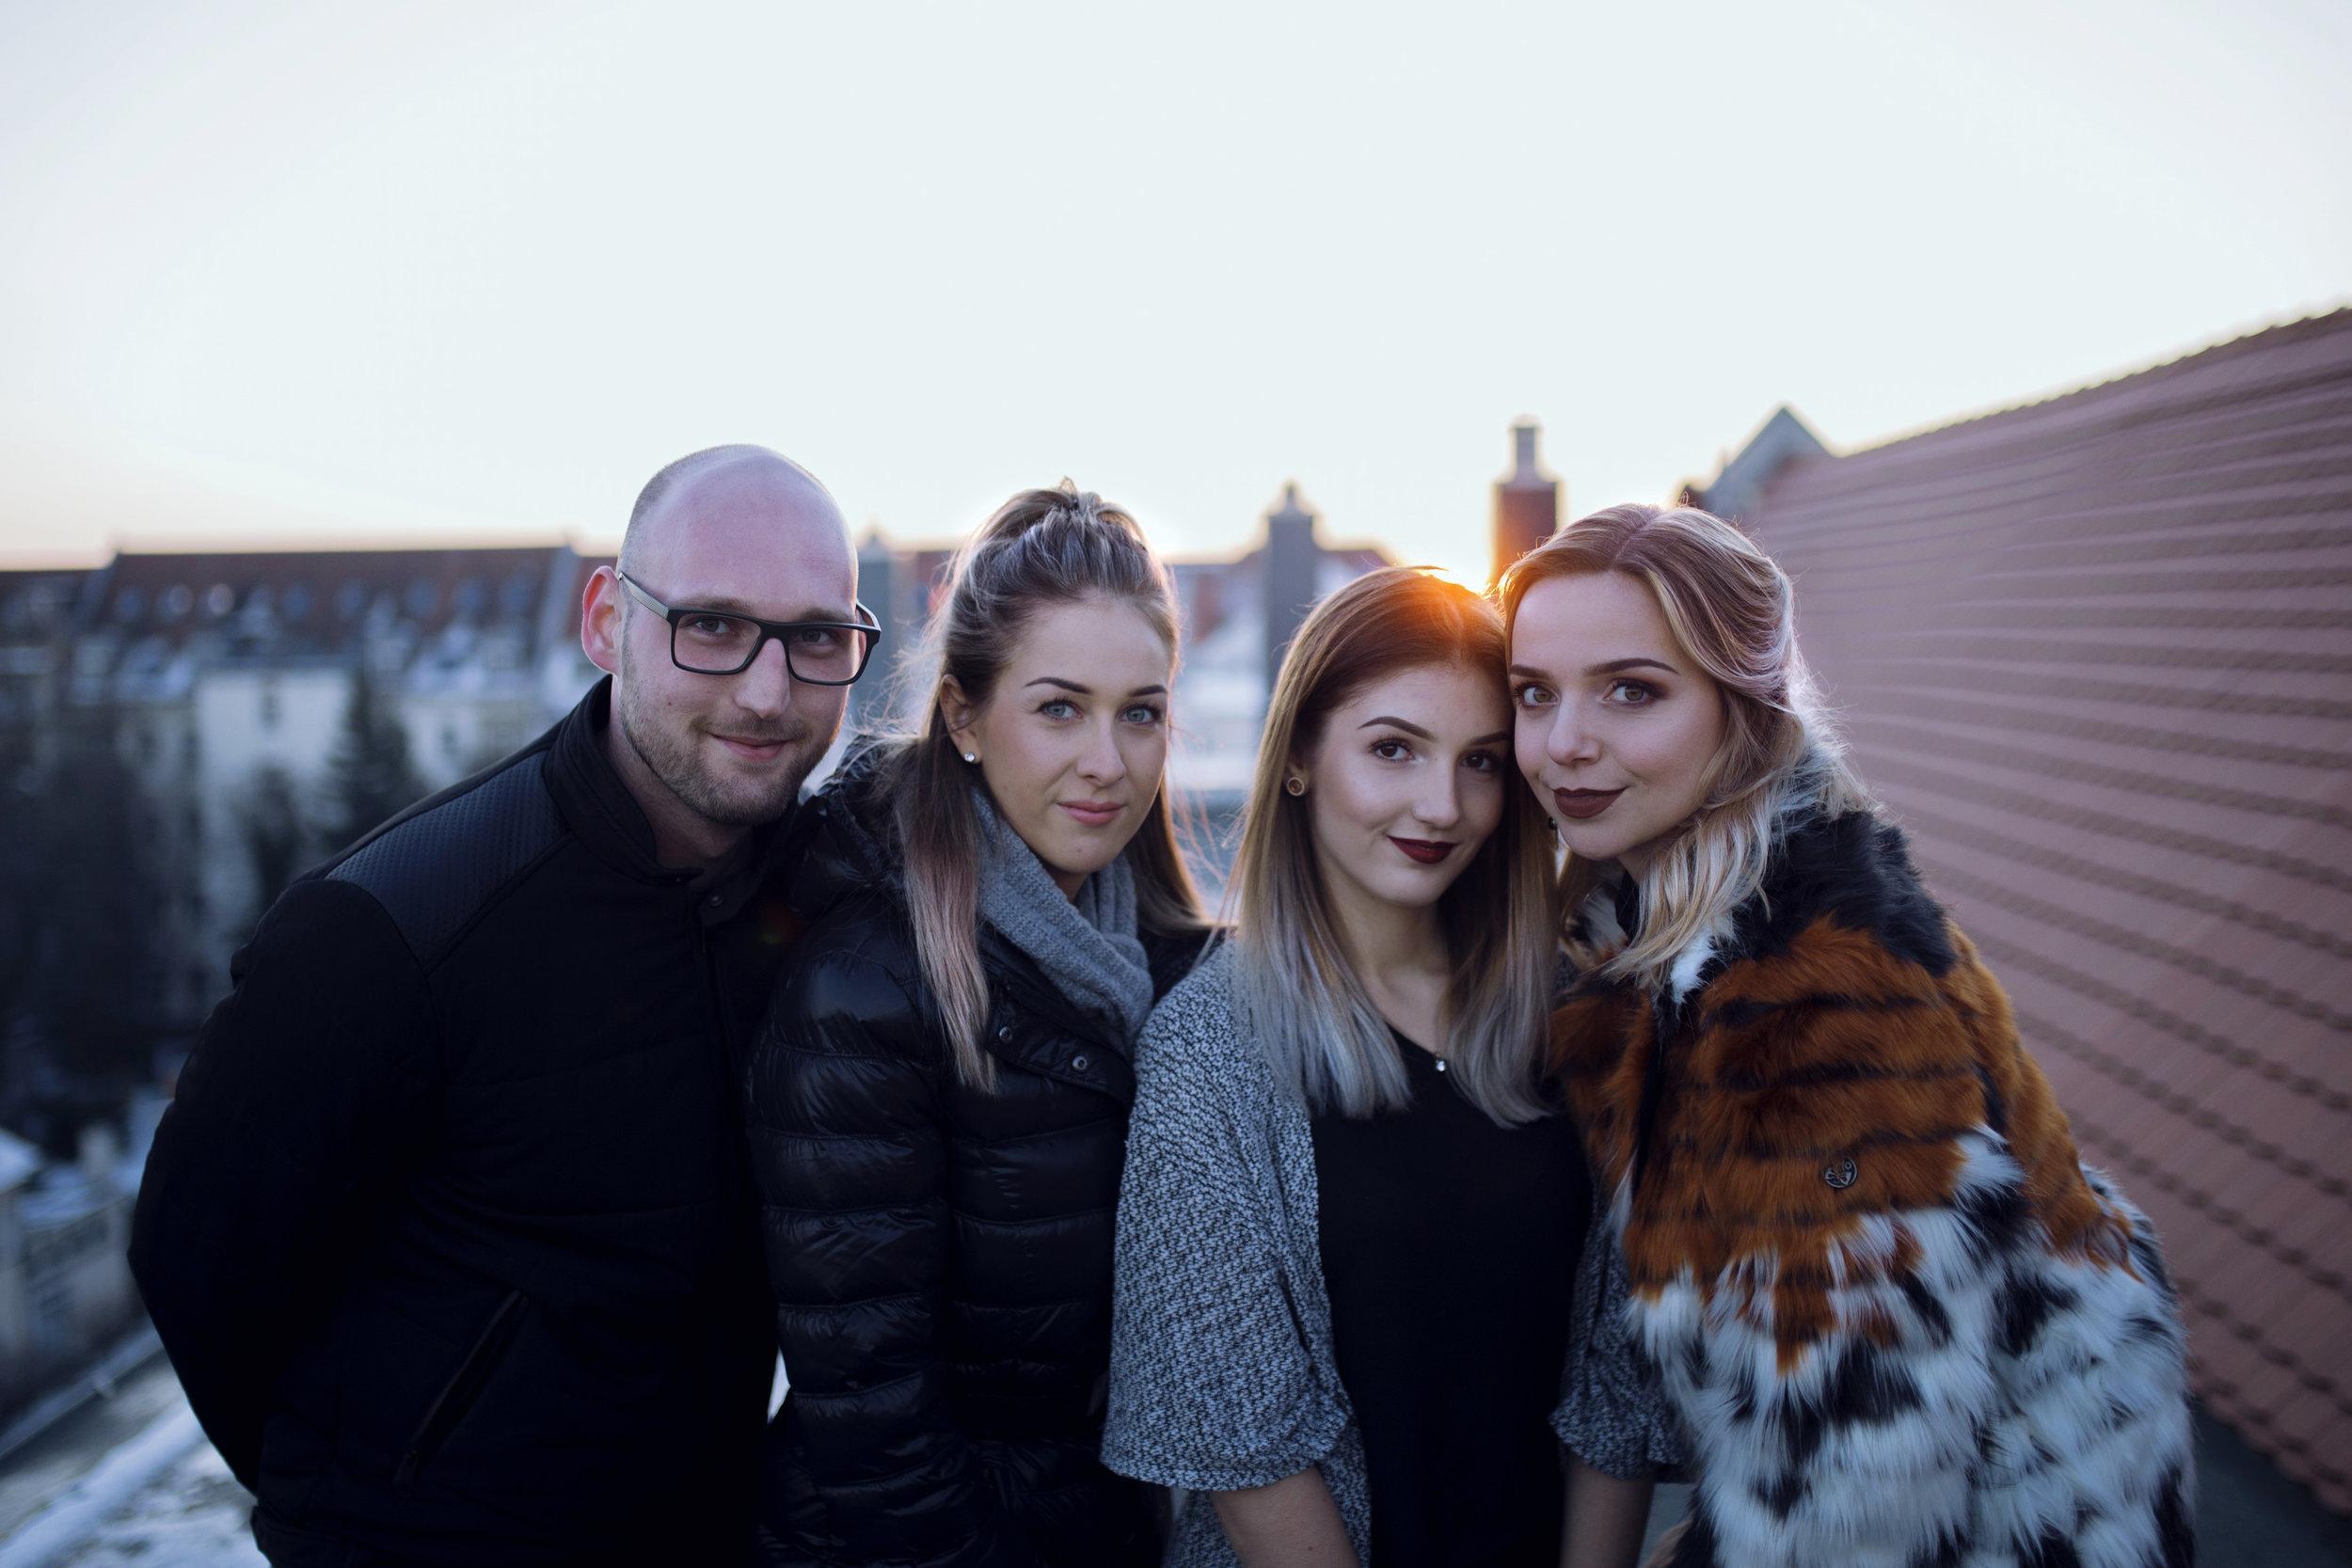 Das Team (v.l.n.r.): Max, Fanny, Dayana, ich)